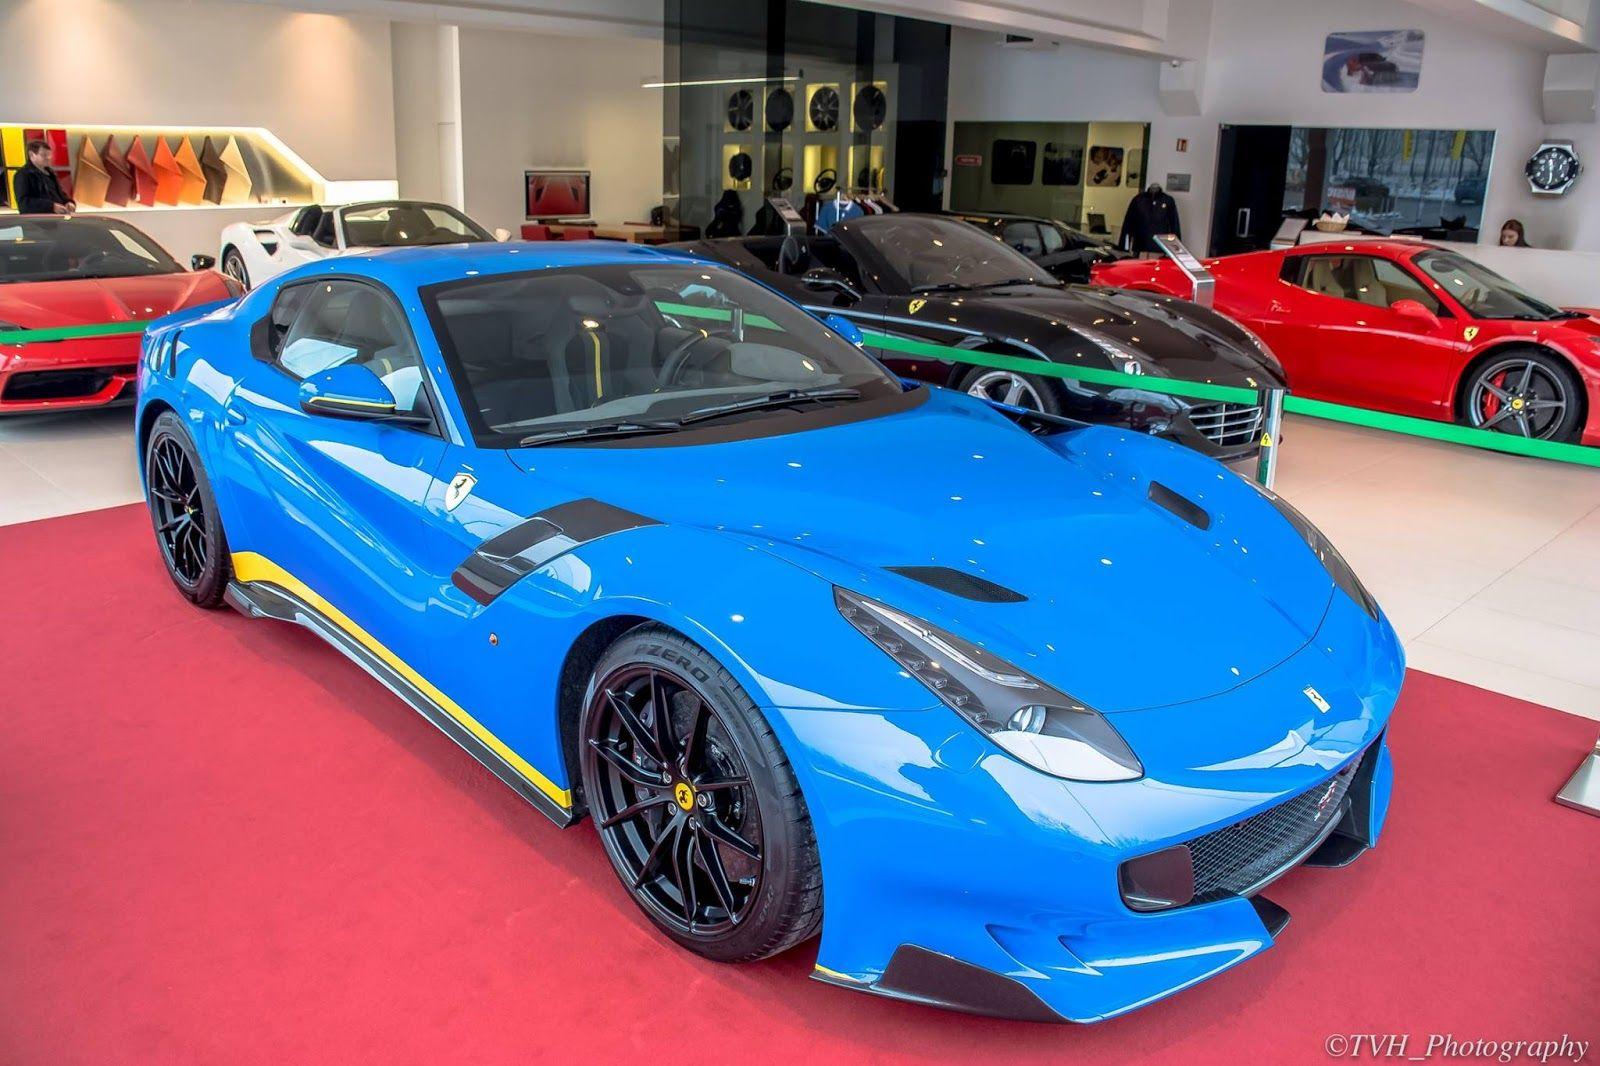 azzurro dino blue ferrari f12tdf is a 770hp smurf | automotive